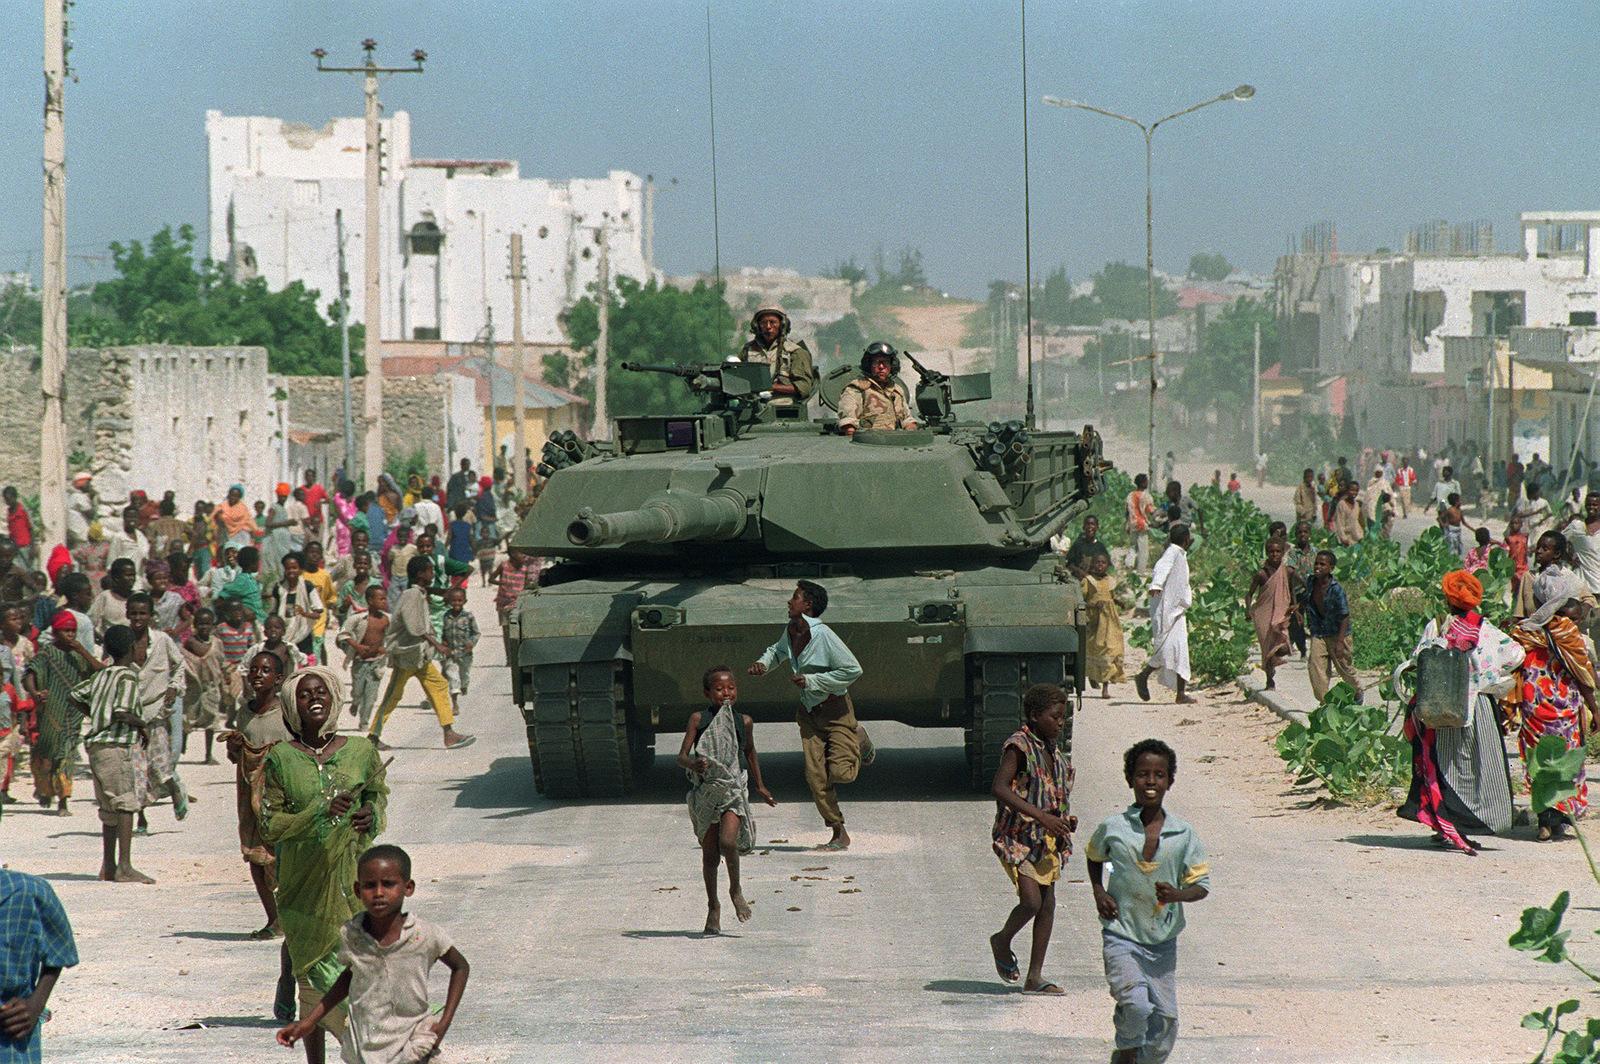 Somali children run alongside a U.S. Marine M-1 Abrams tank during an armored patrol in north Mogadishu, Somalia, Jan. 26, 1993. (AP/Mark Duncan)